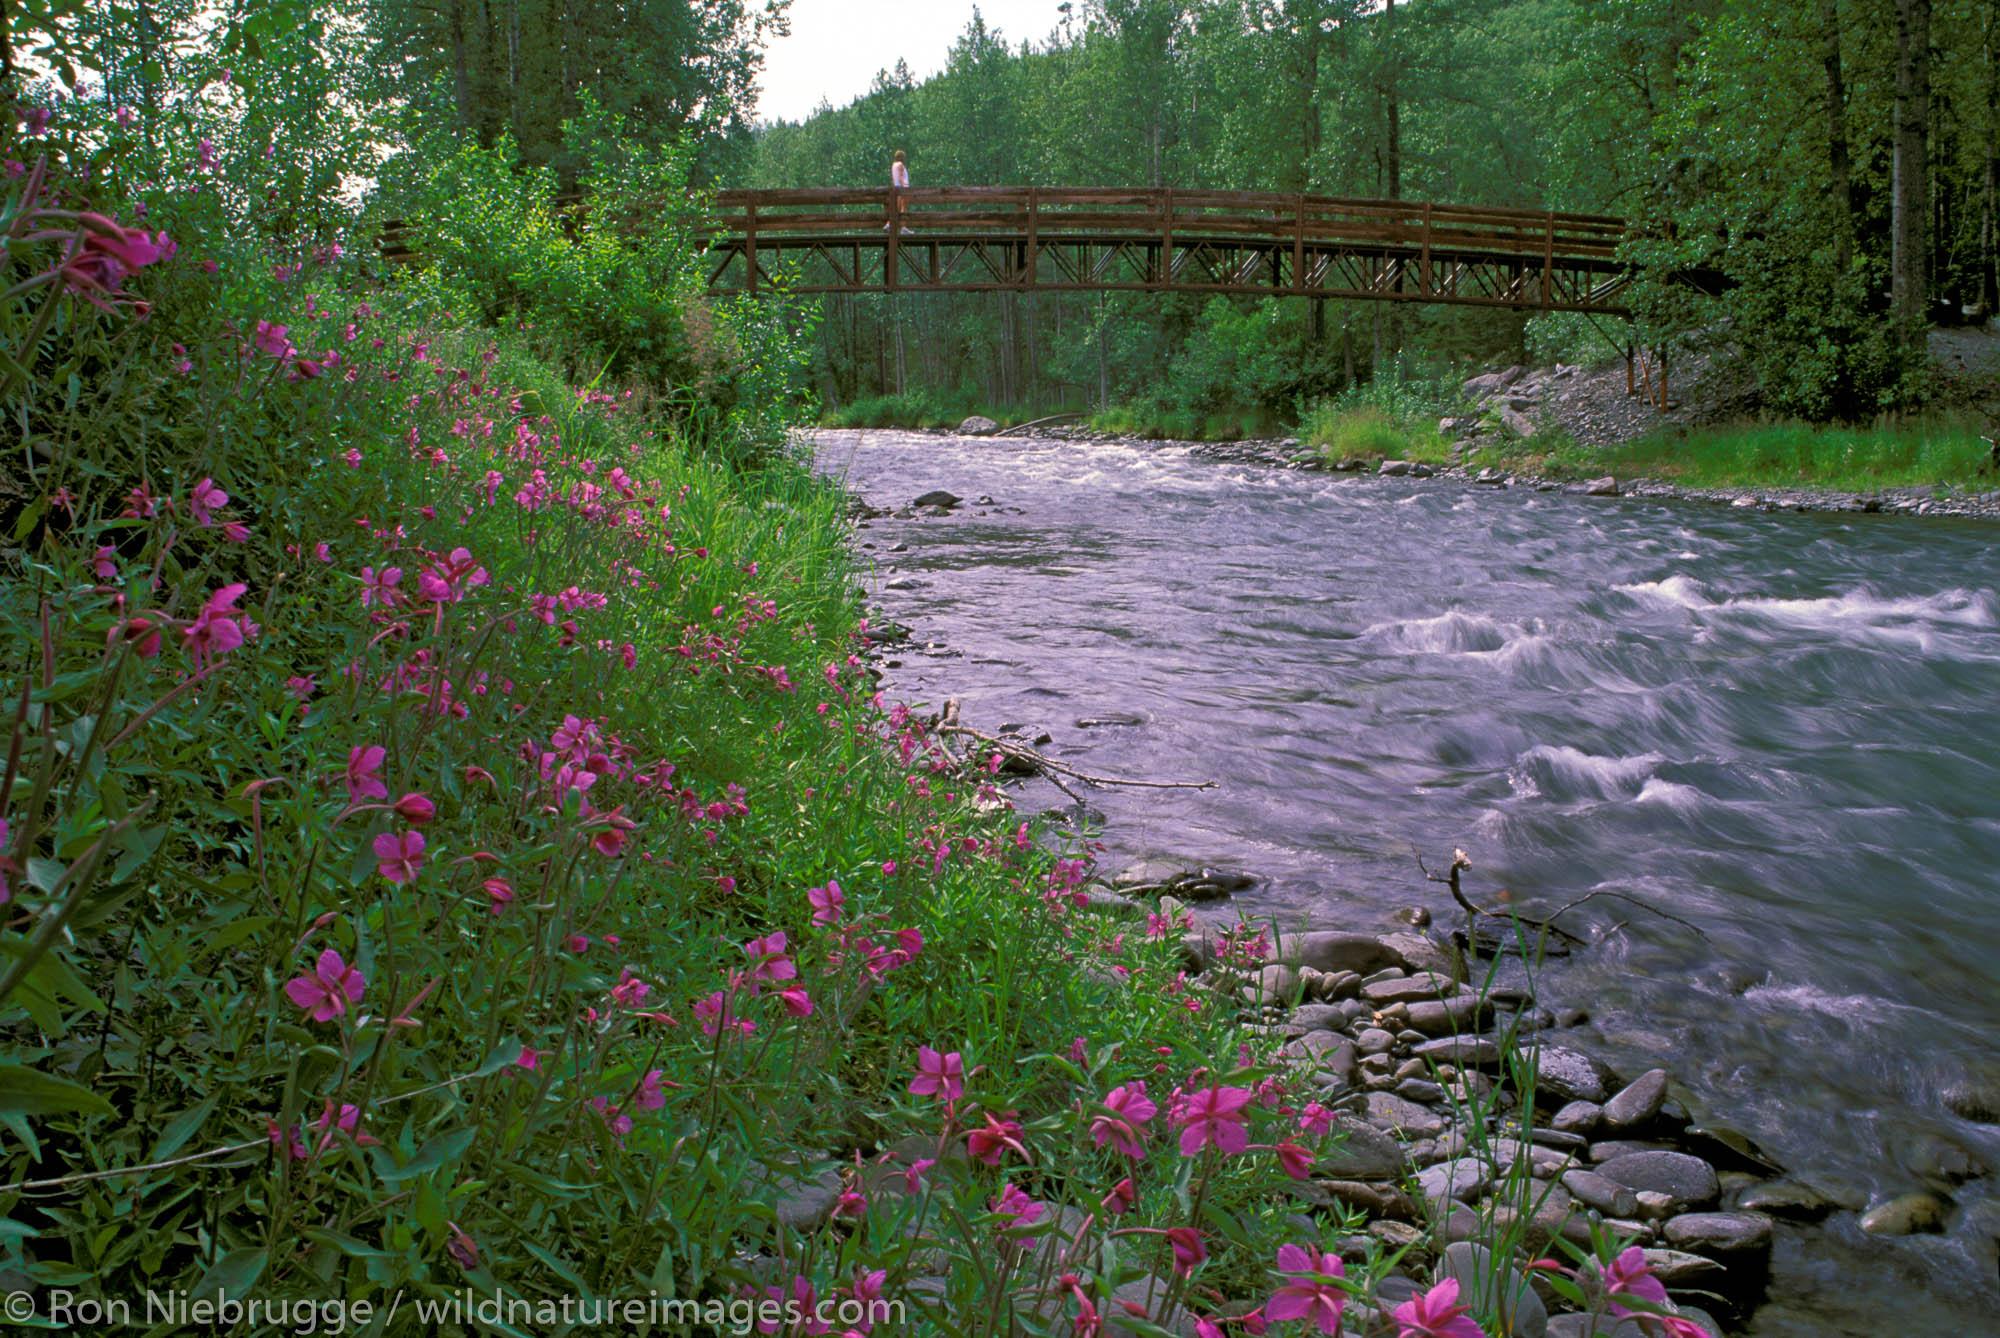 Bridge over Resurrection Creek on the Resurrection River Trail, Chugach National Forest, near Hope, Alaska.